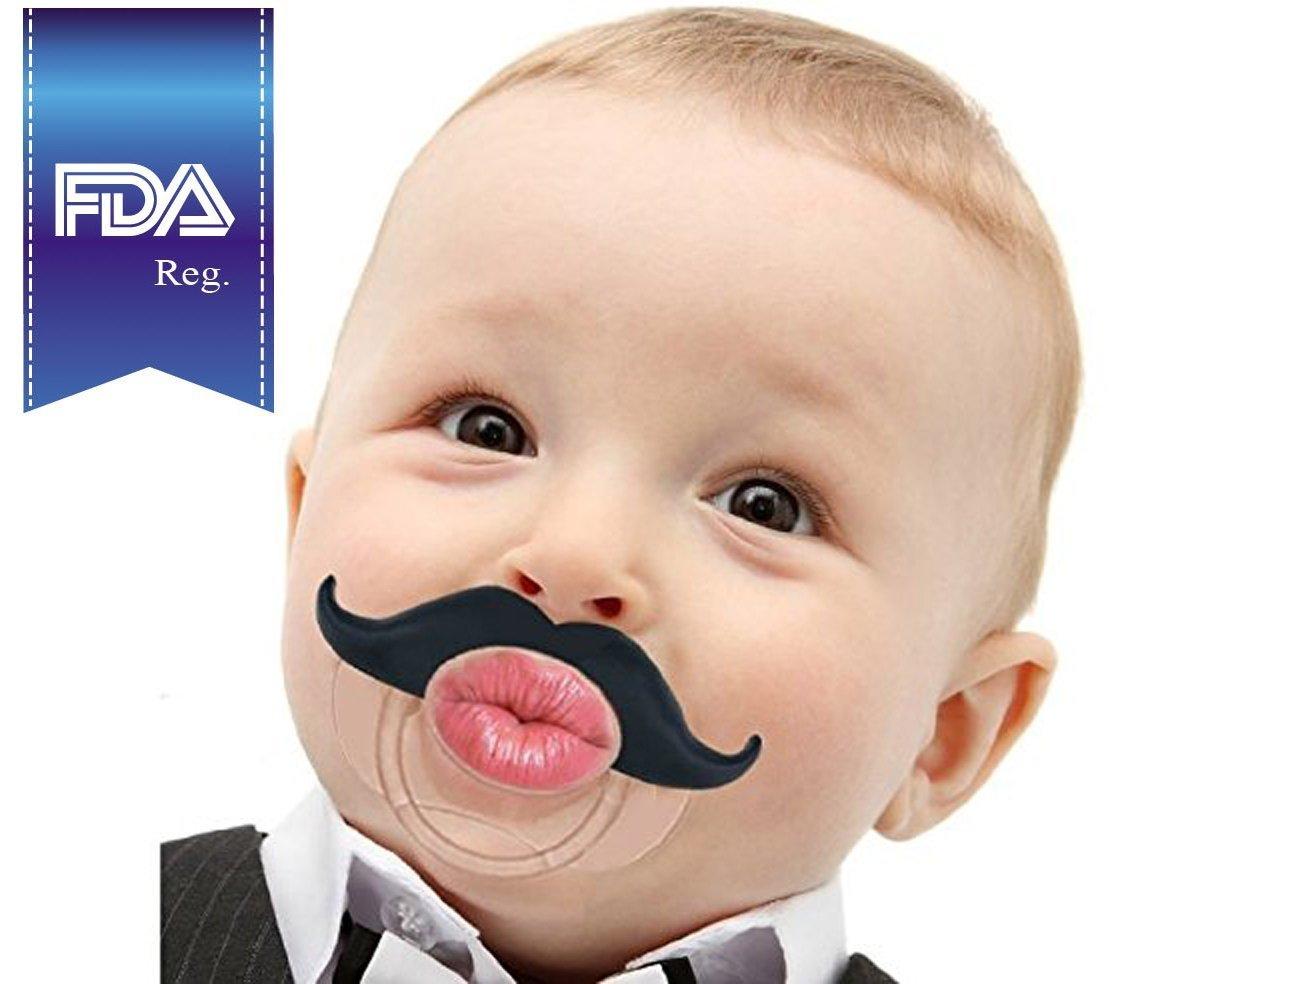 Empeng Lucu Dan Unik Untuk Bayi Aurea Perfume